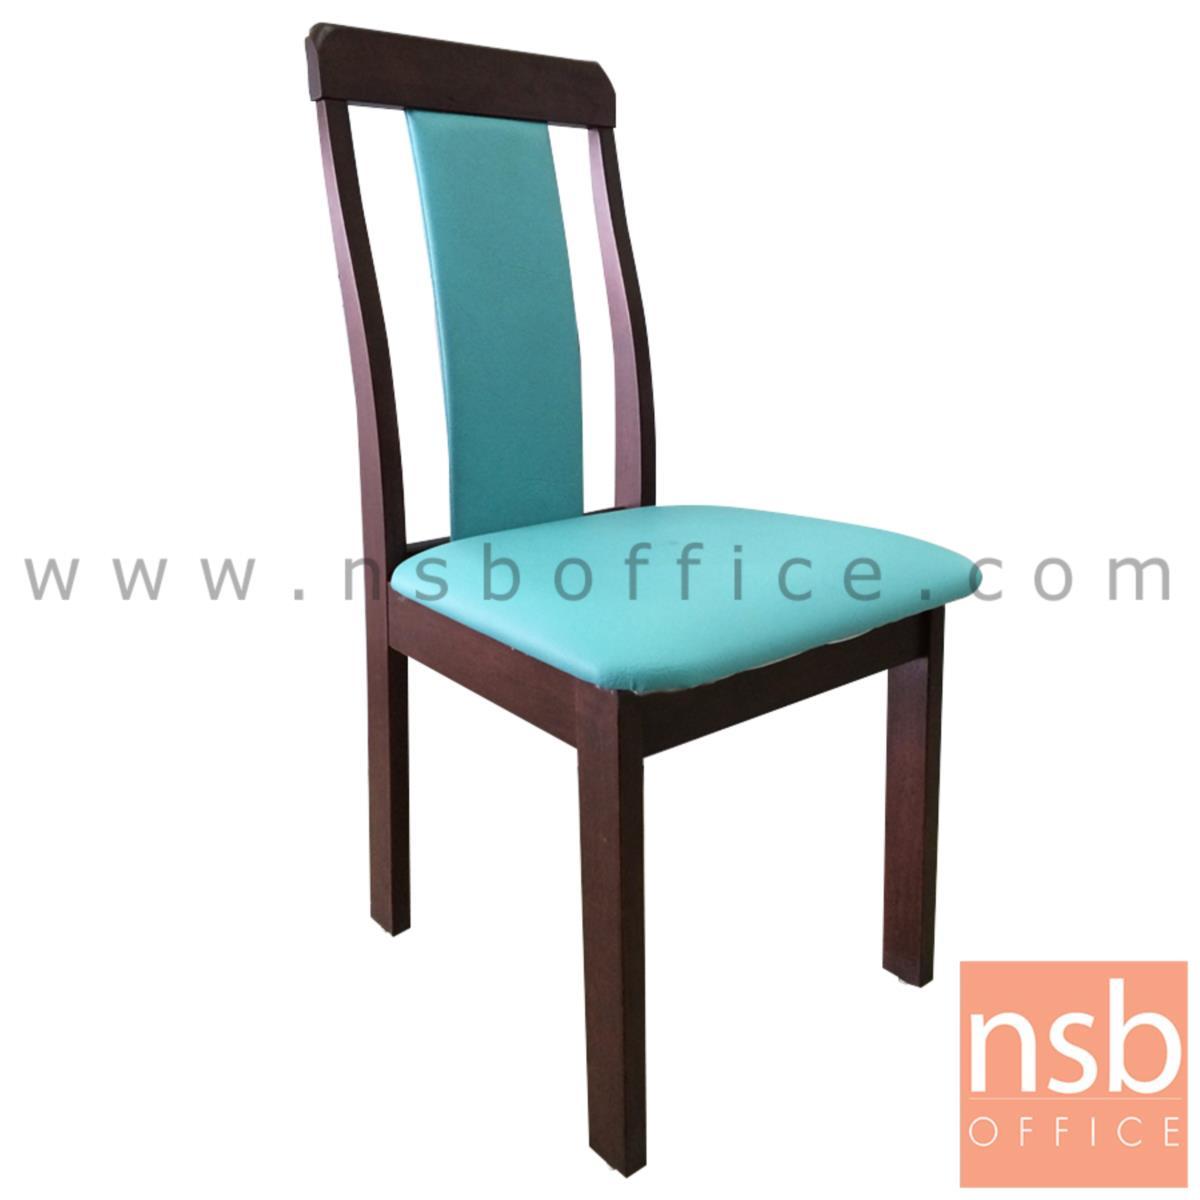 G14A040:เก้าอี้ไม้ยางพาราที่นั่งหุ้มหนังเทียม รุ่น Byatt (ไบแอ็ท) ขาไม้